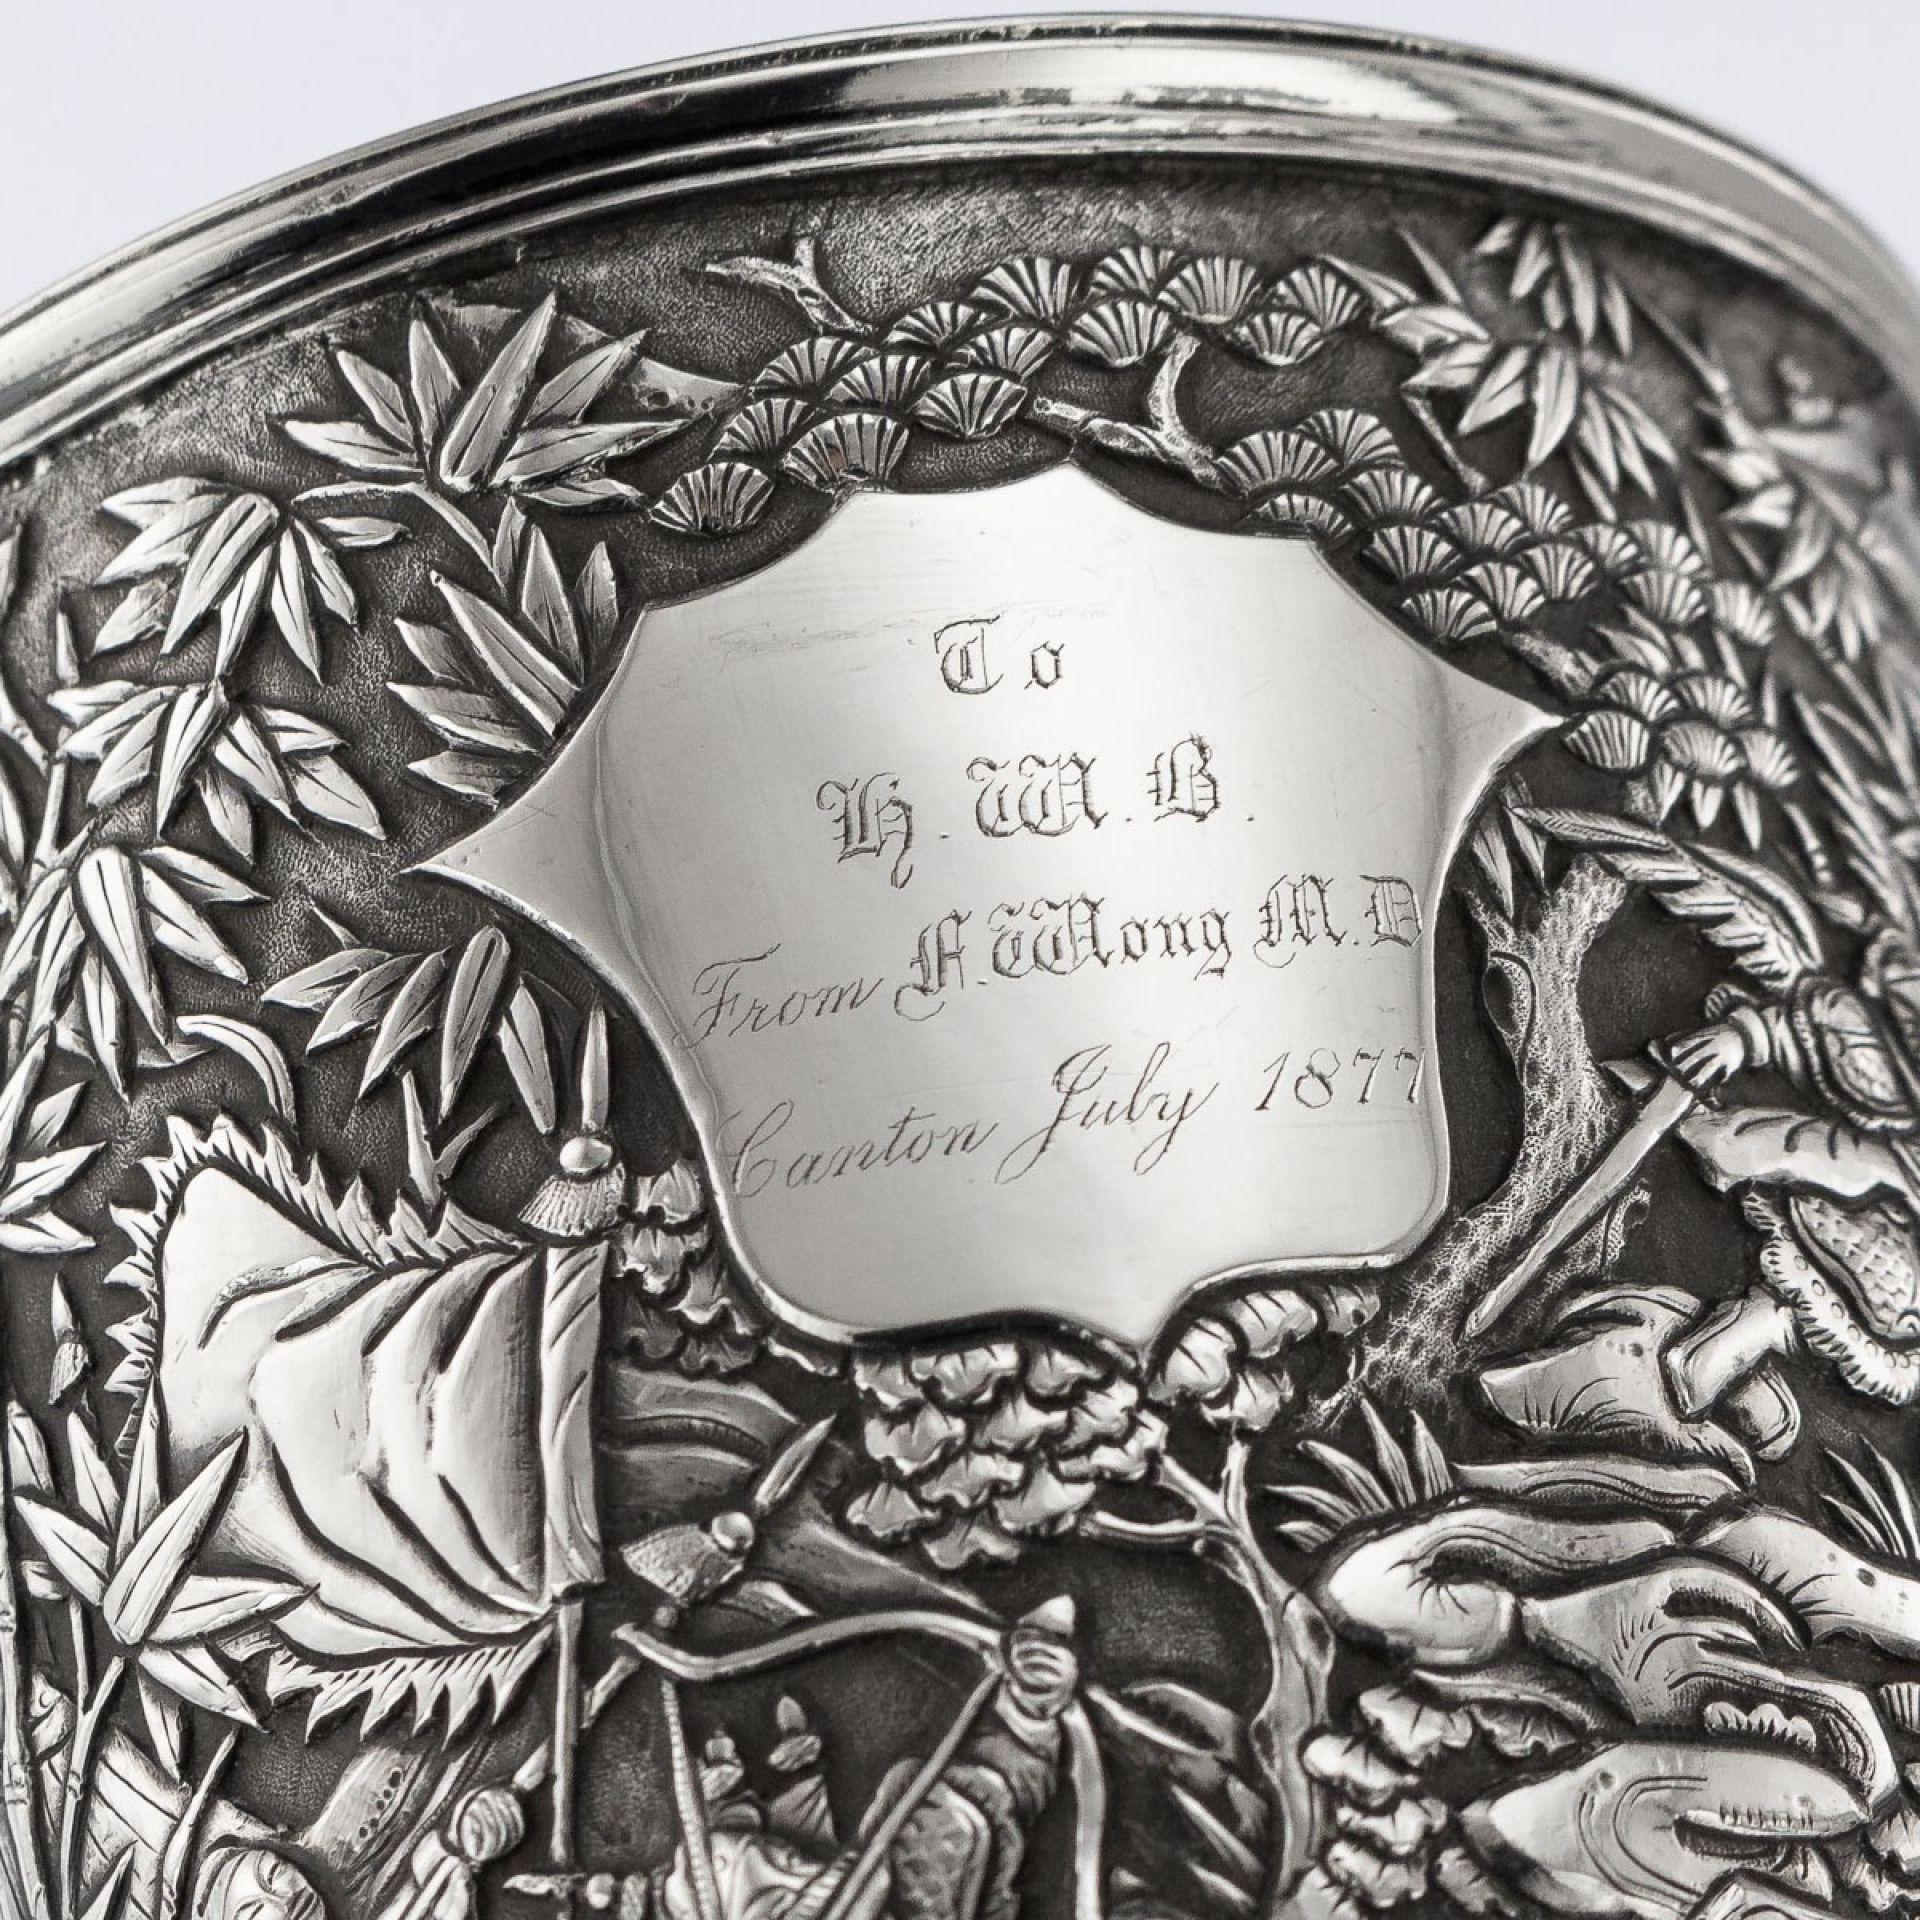 ANTIQUE 19thC CHINESE EXPORT SOLID SILVER BATTLE SCENE MUG, LEECHING c.1870